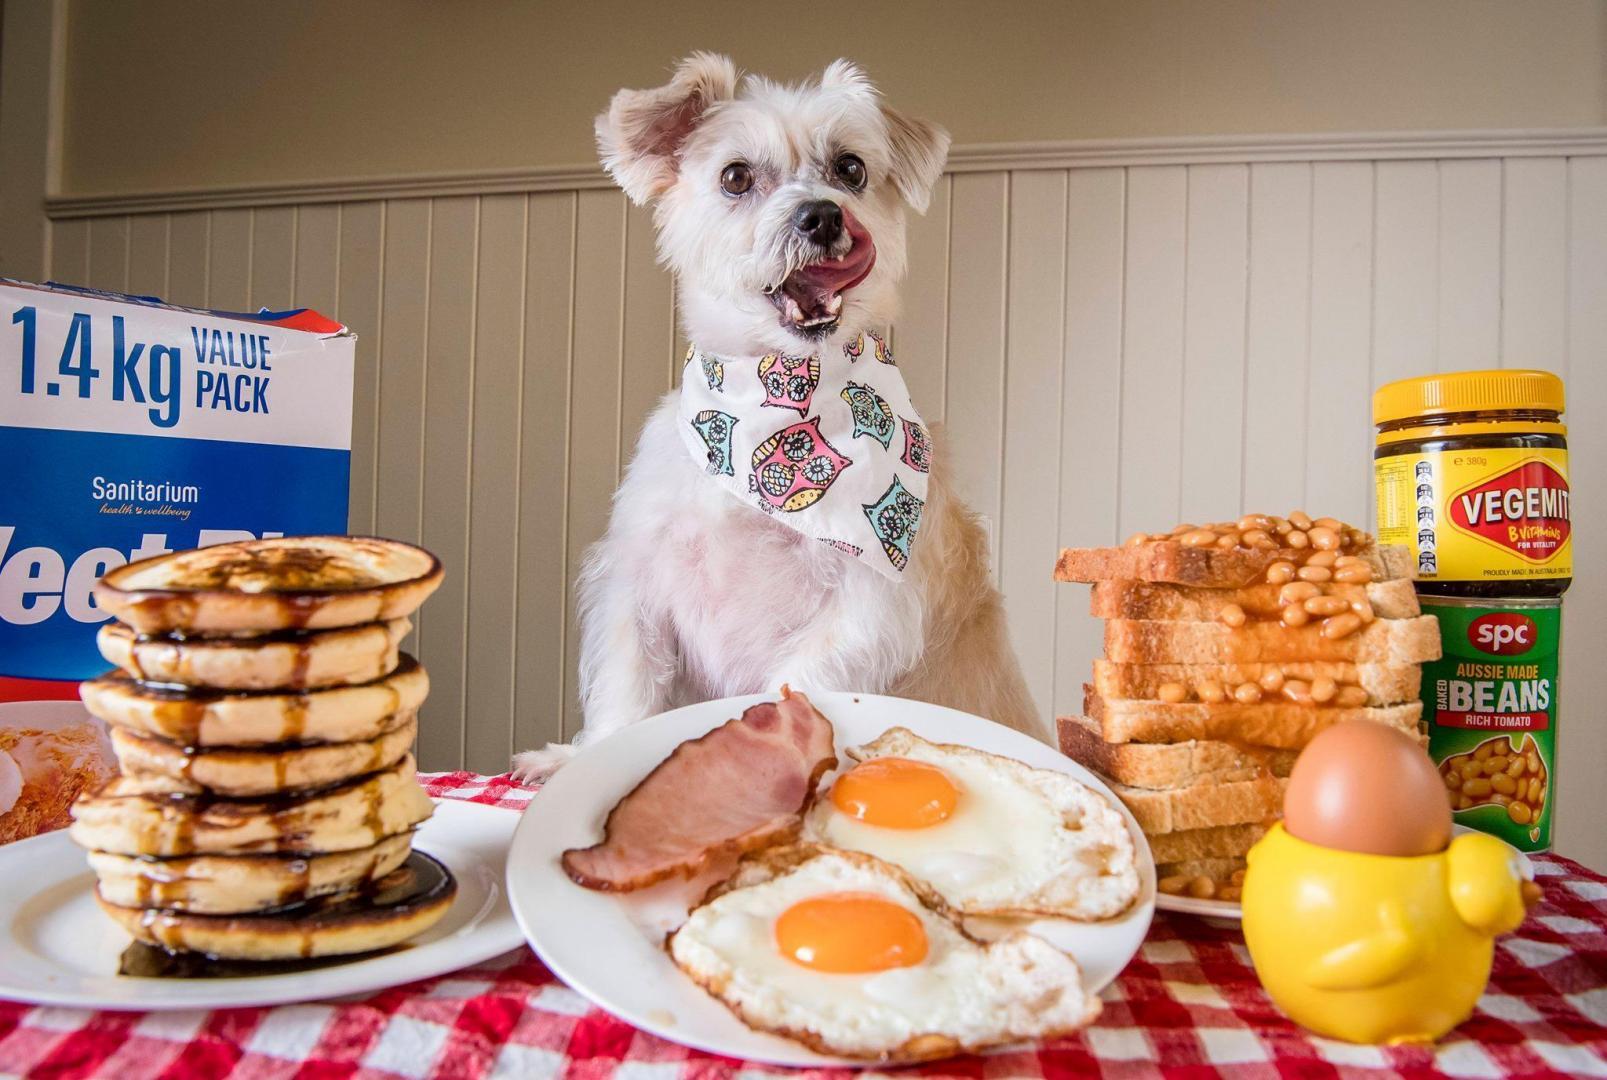 victorian-dog-rescue-spring-into-spring-breakfast-11.thumb.jpg.b9ee3044fd7e5c74b821cfb1da8f2f29.jpg